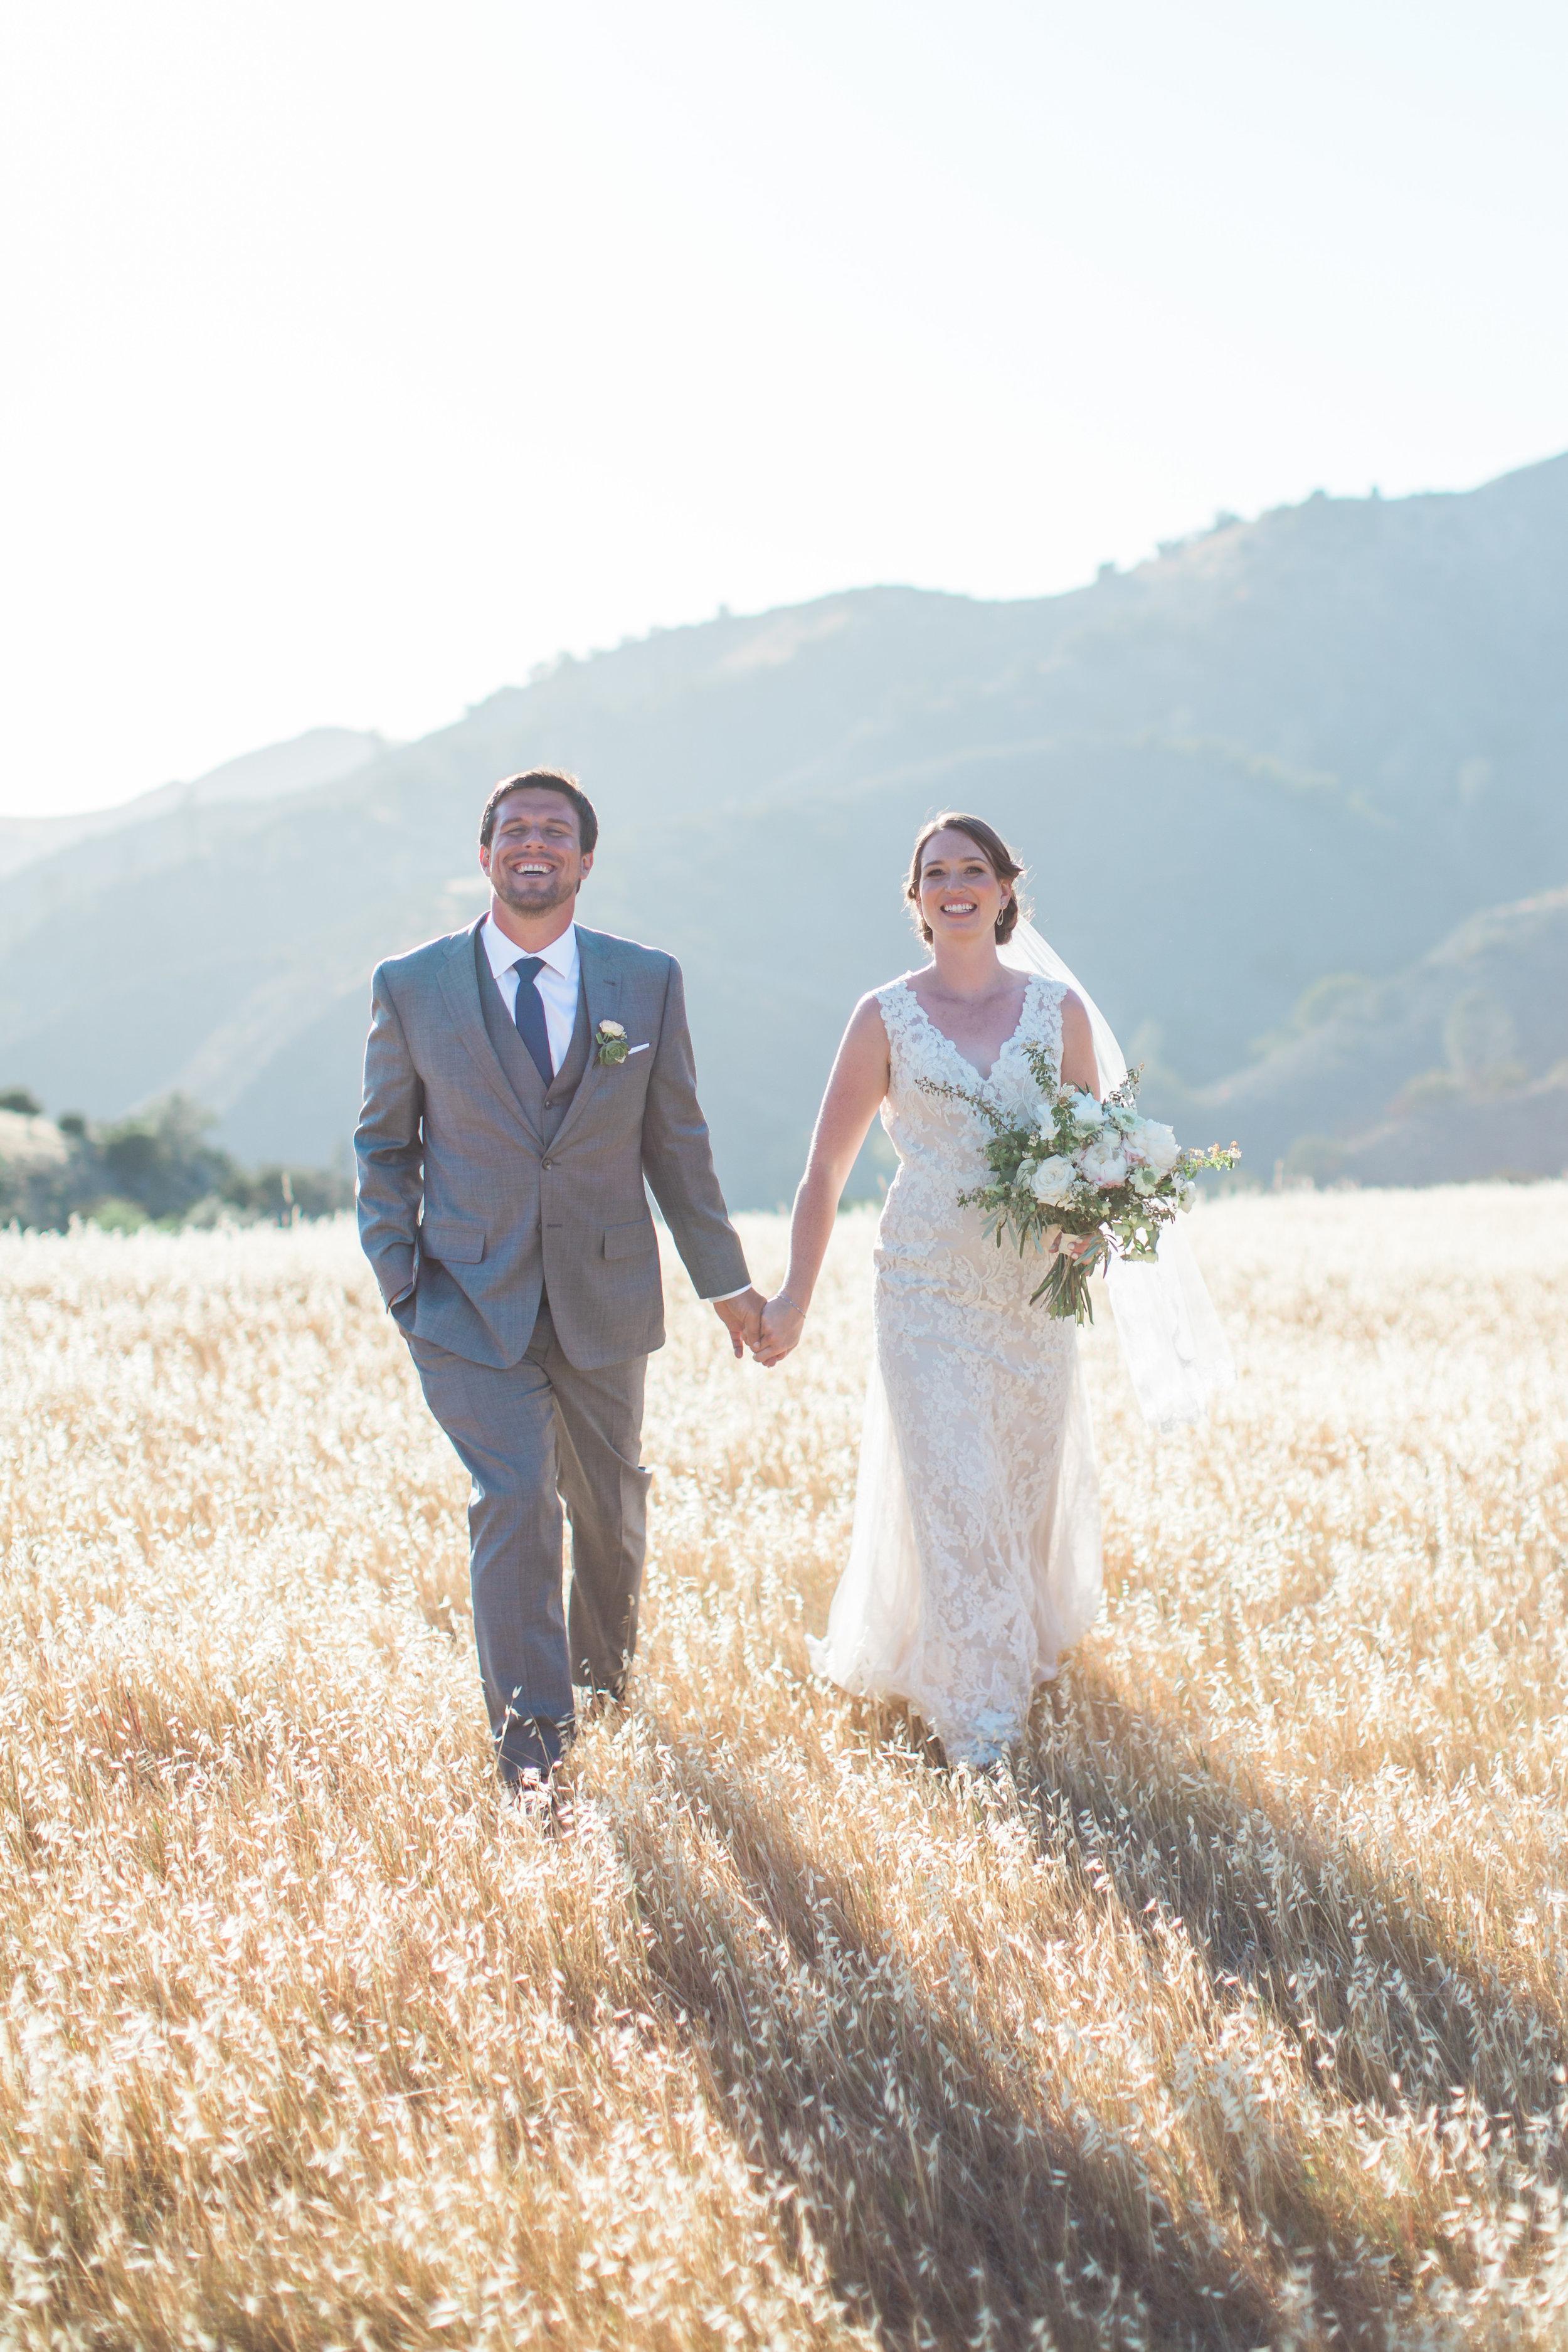 www.santabarbarawedding.com | Kiel Rucker Photography | Joelle Charming Wedding Planner | Figueroa Mountain Farmhouse | Ella & Louie Flowers | Bride & Groom